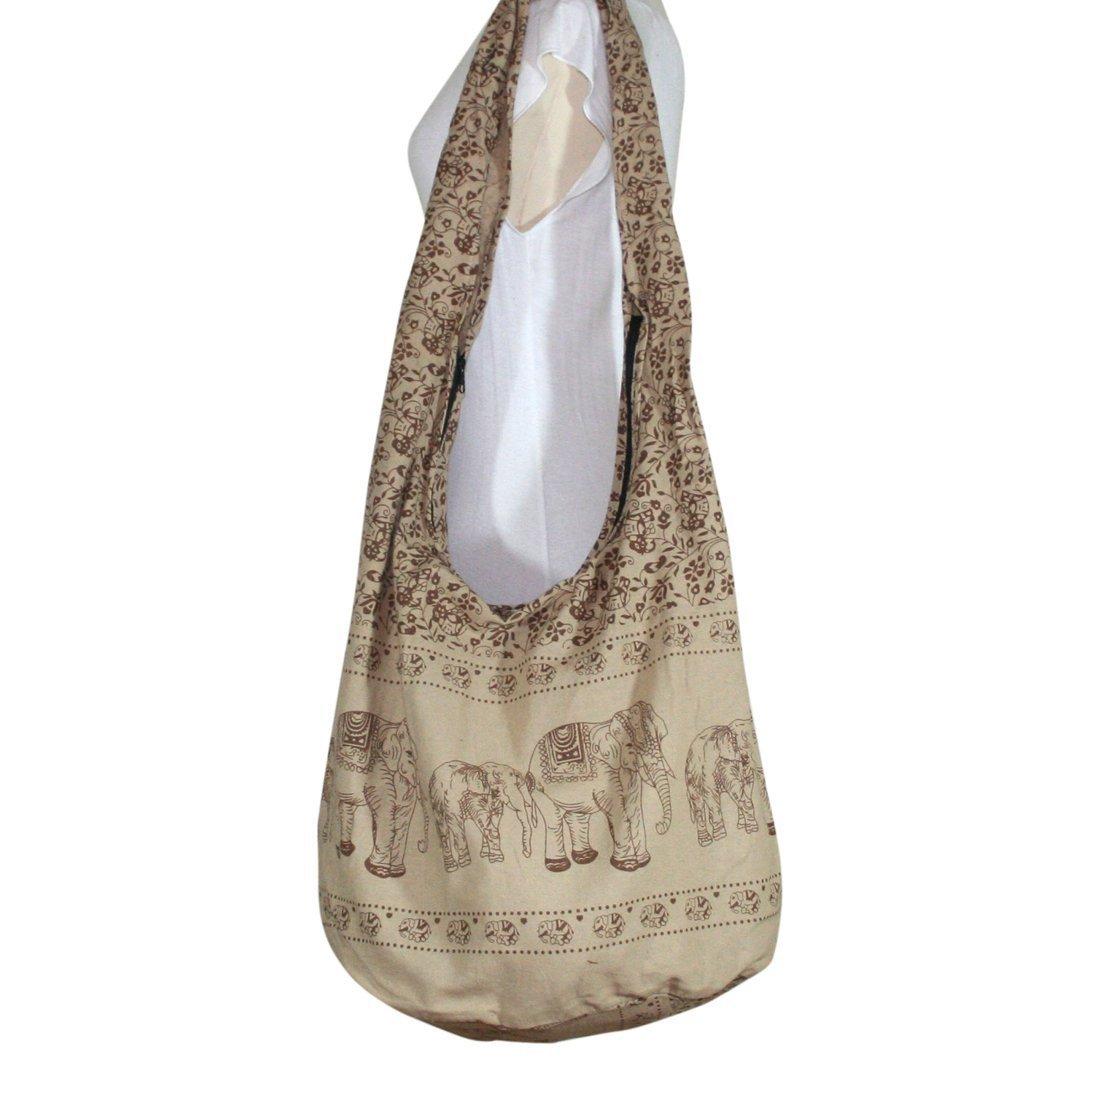 thai elephant bag purse crossbody sling shoulder hippie